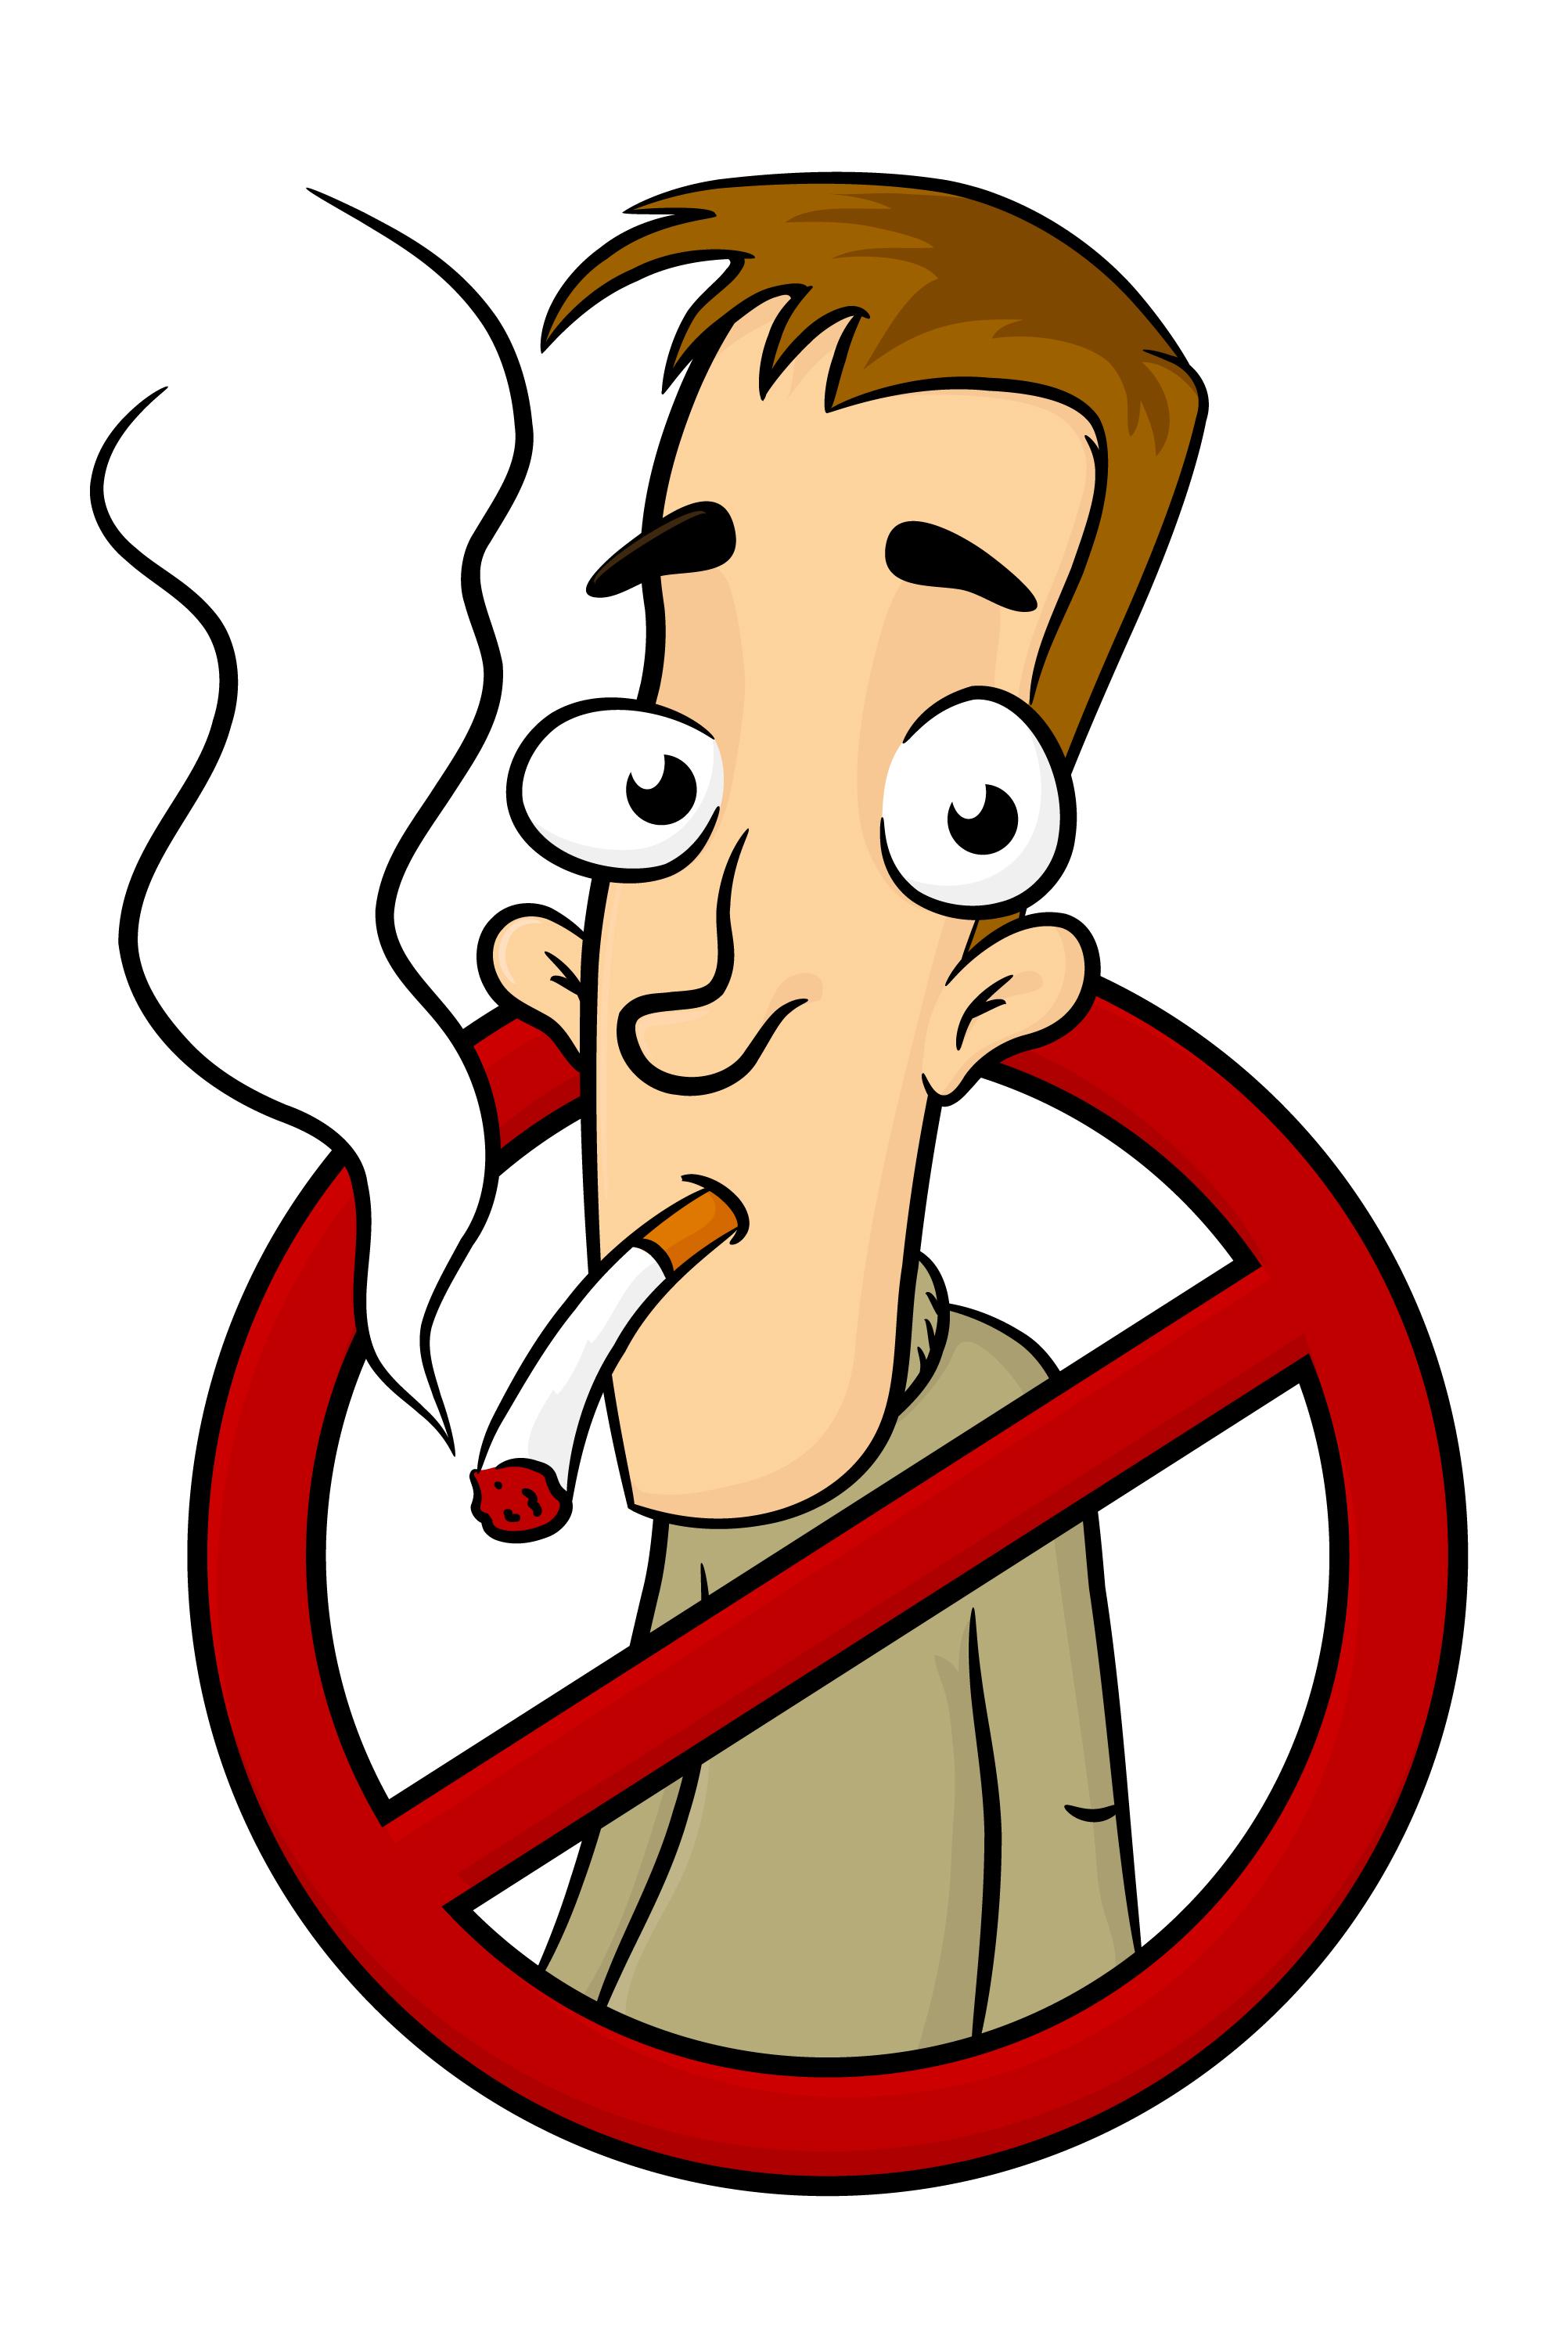 No smoking sign clip art 2.